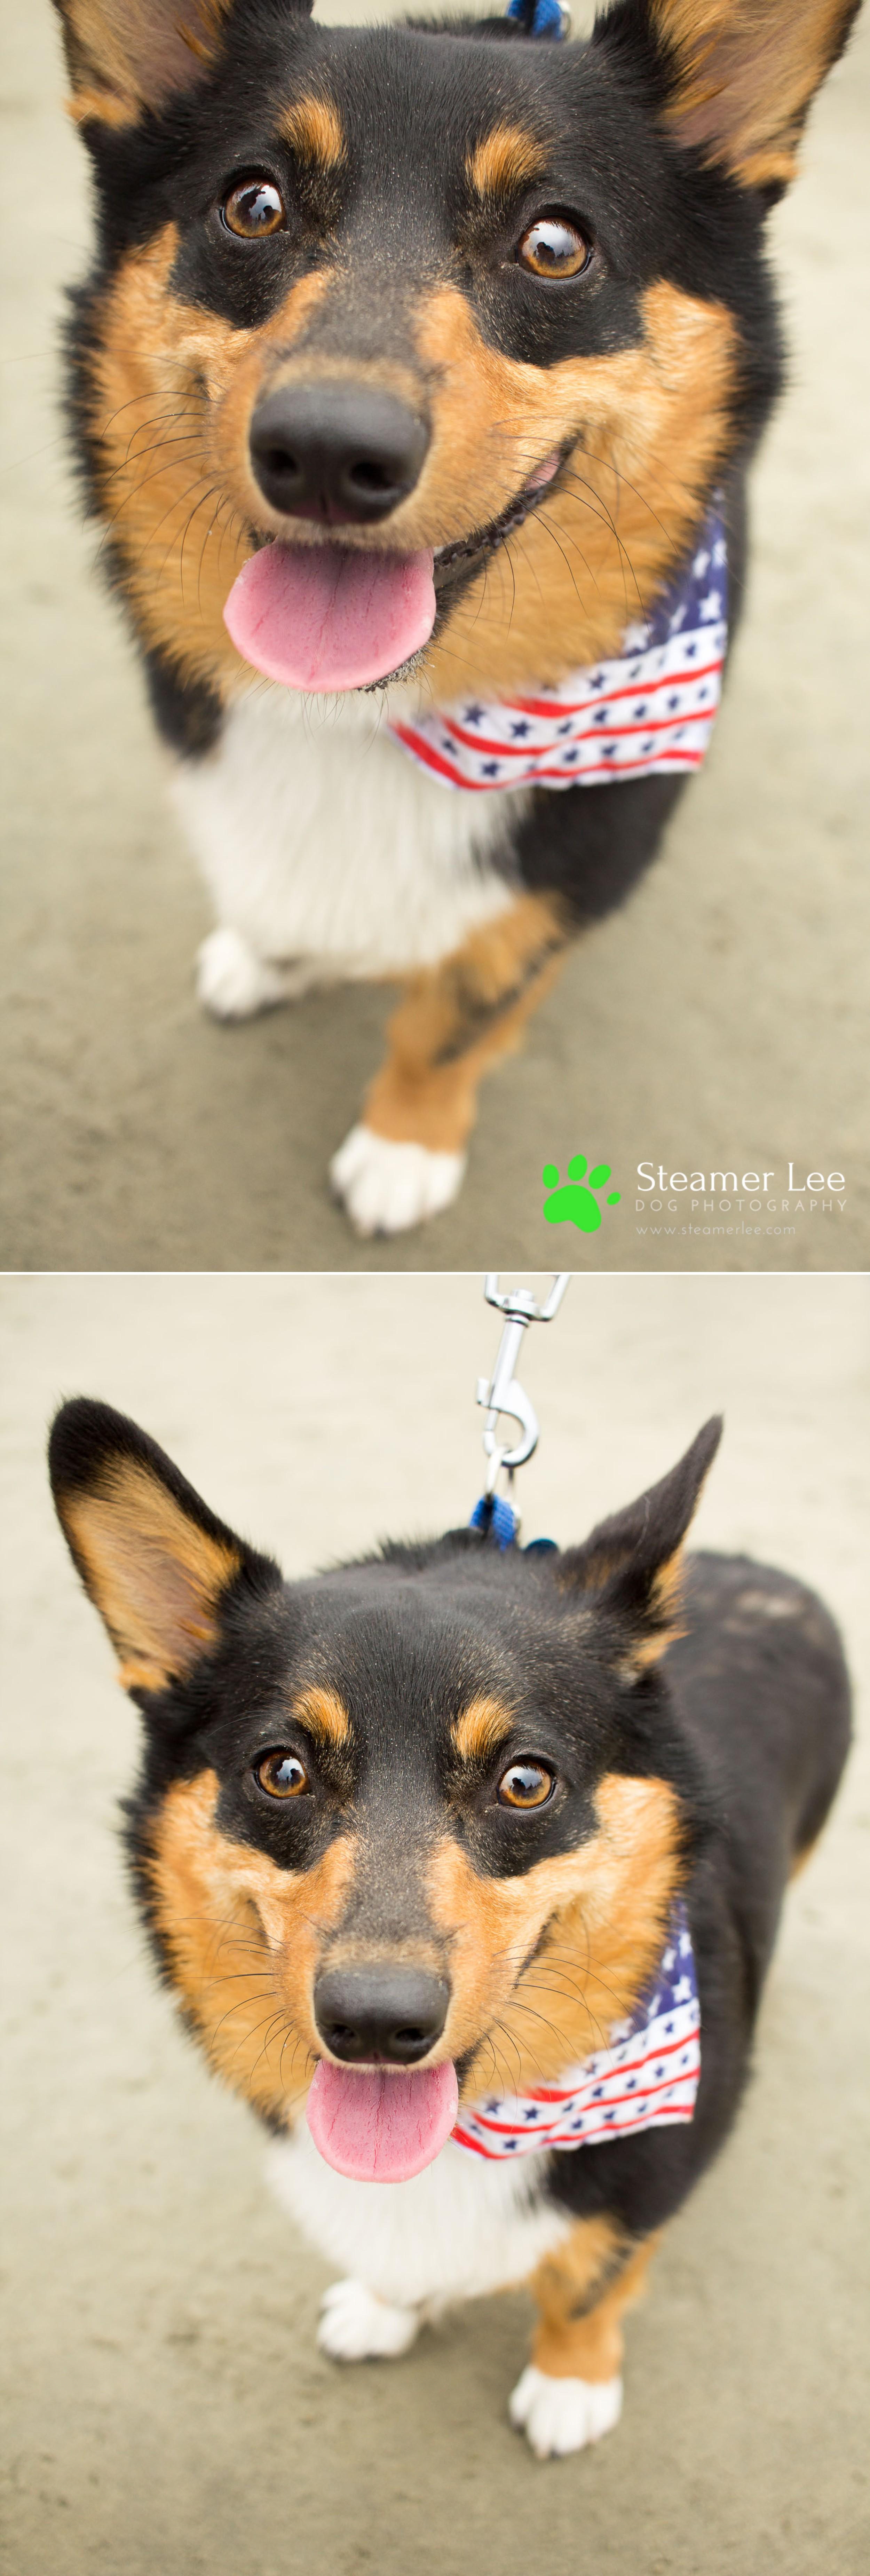 Steamer Lee Dog Photography - July 2017 So Cal Corgi Beach Day - Vol. 3 - 33.jpg